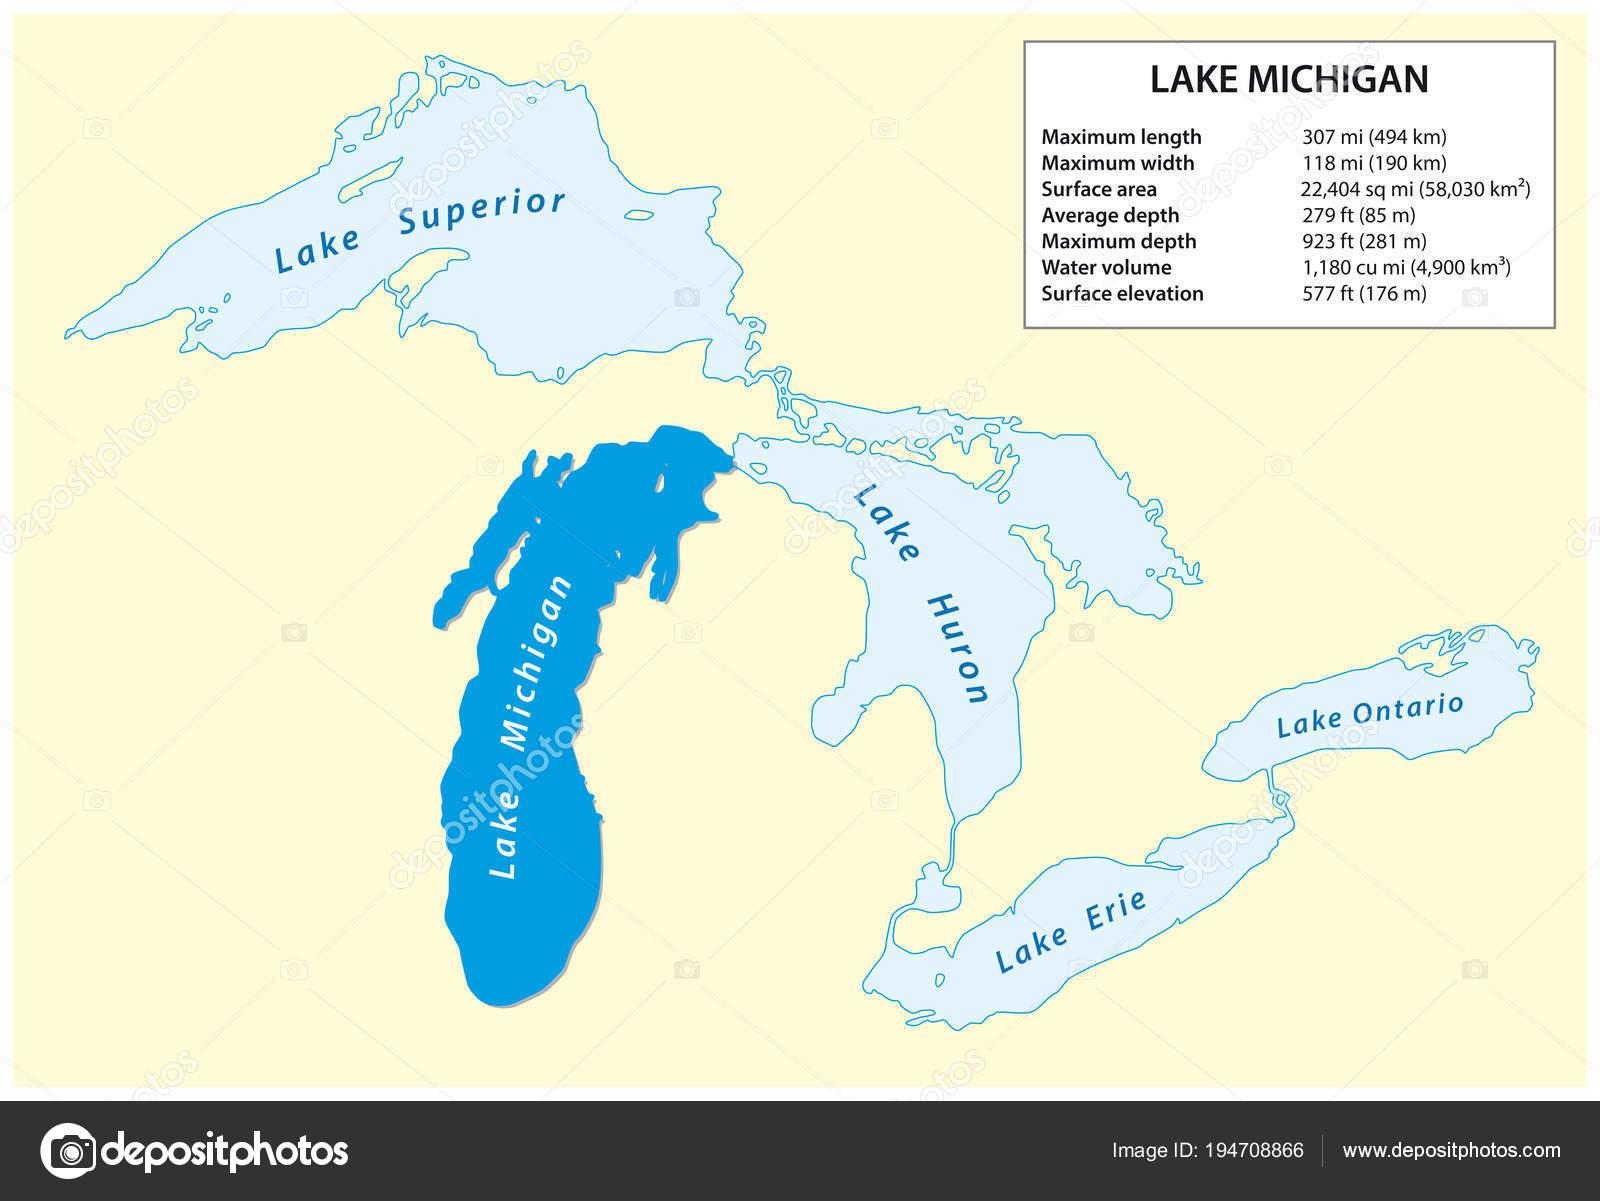 information vector map lake michigan north america stock vector c lesniewski 194708866 https depositphotos com 194708866 stock illustration information vector map lake michigan html